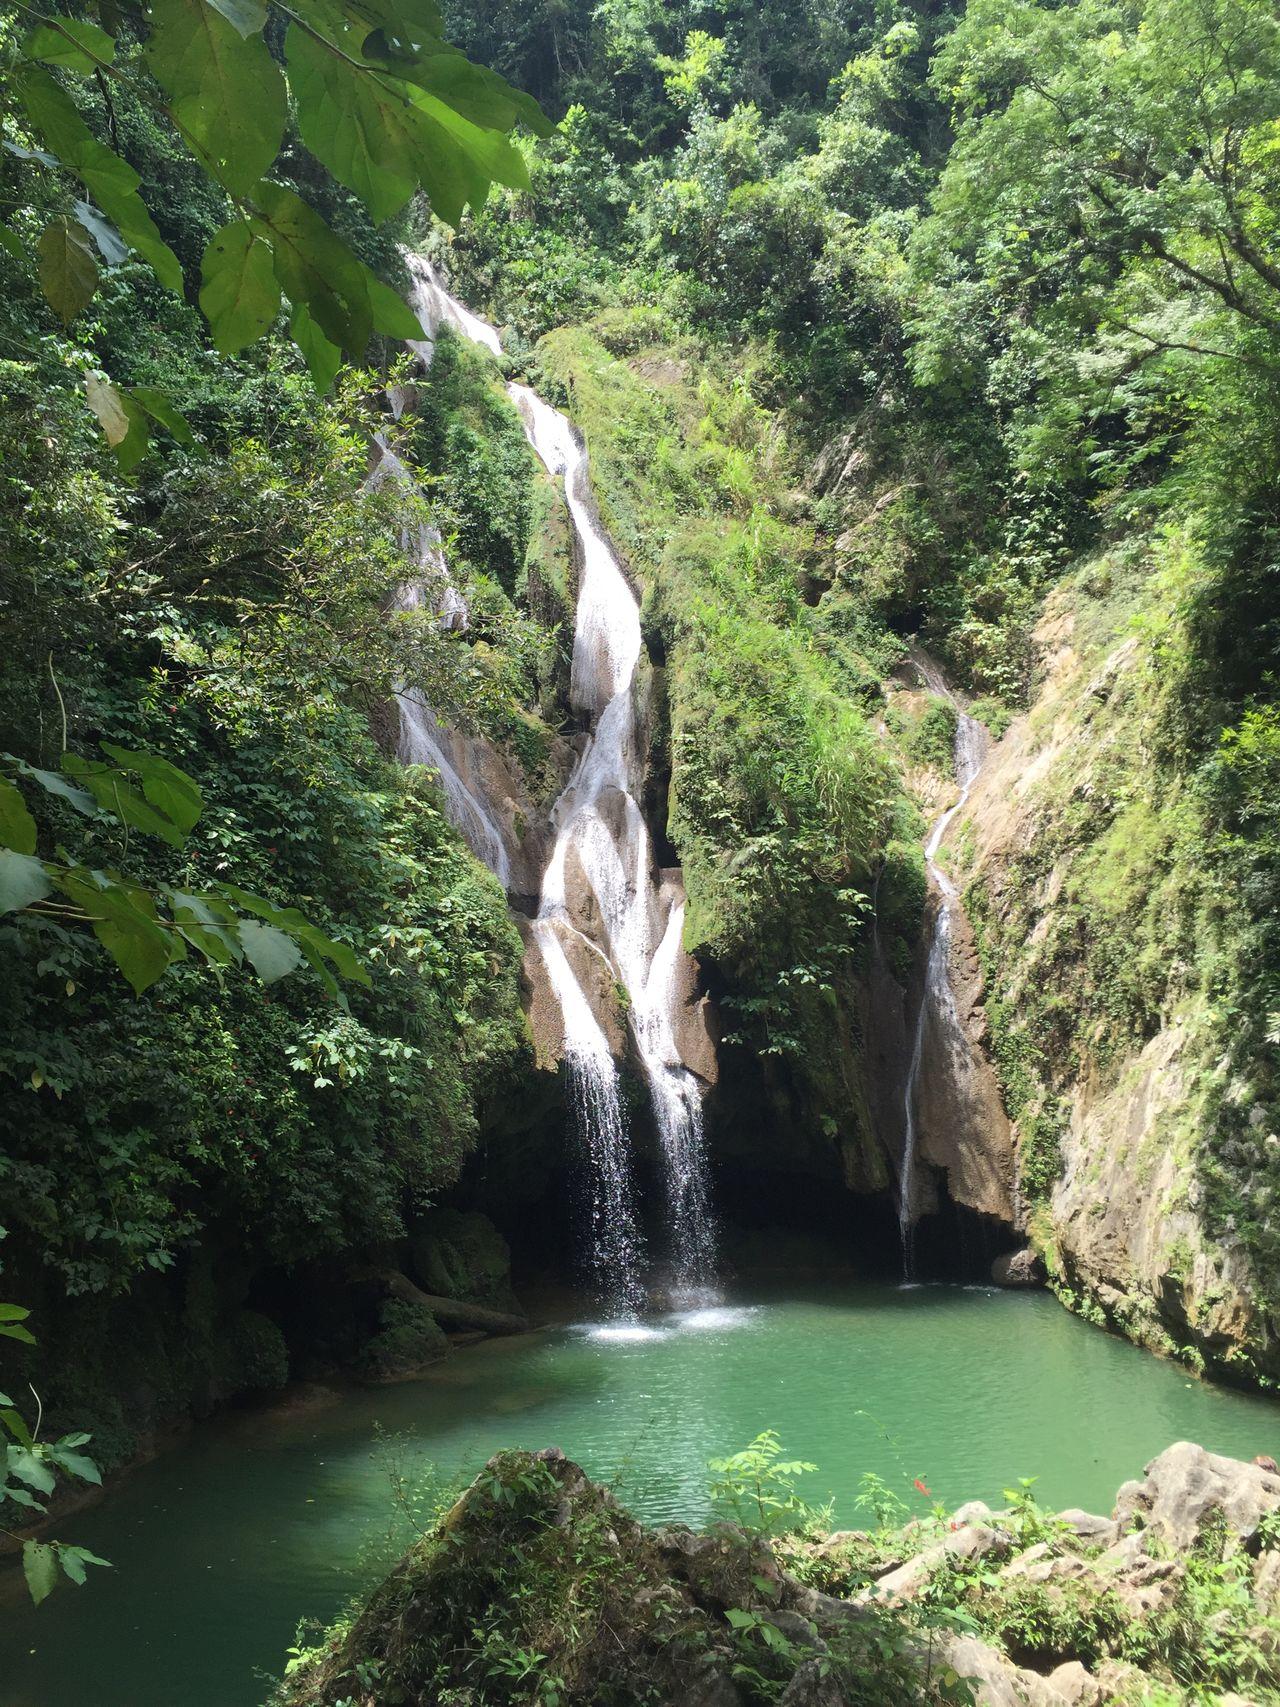 Vegas Grandes Waterfall, Topes de Collantes, Trinidad, Cuba #beautiful #cuba #landscape #nature #photography #naturelove #river #rocks #topesdecollantes #trinidad #trinidadcuba Green Color Motion Non-urban Scene Outdoors Water Waterfall